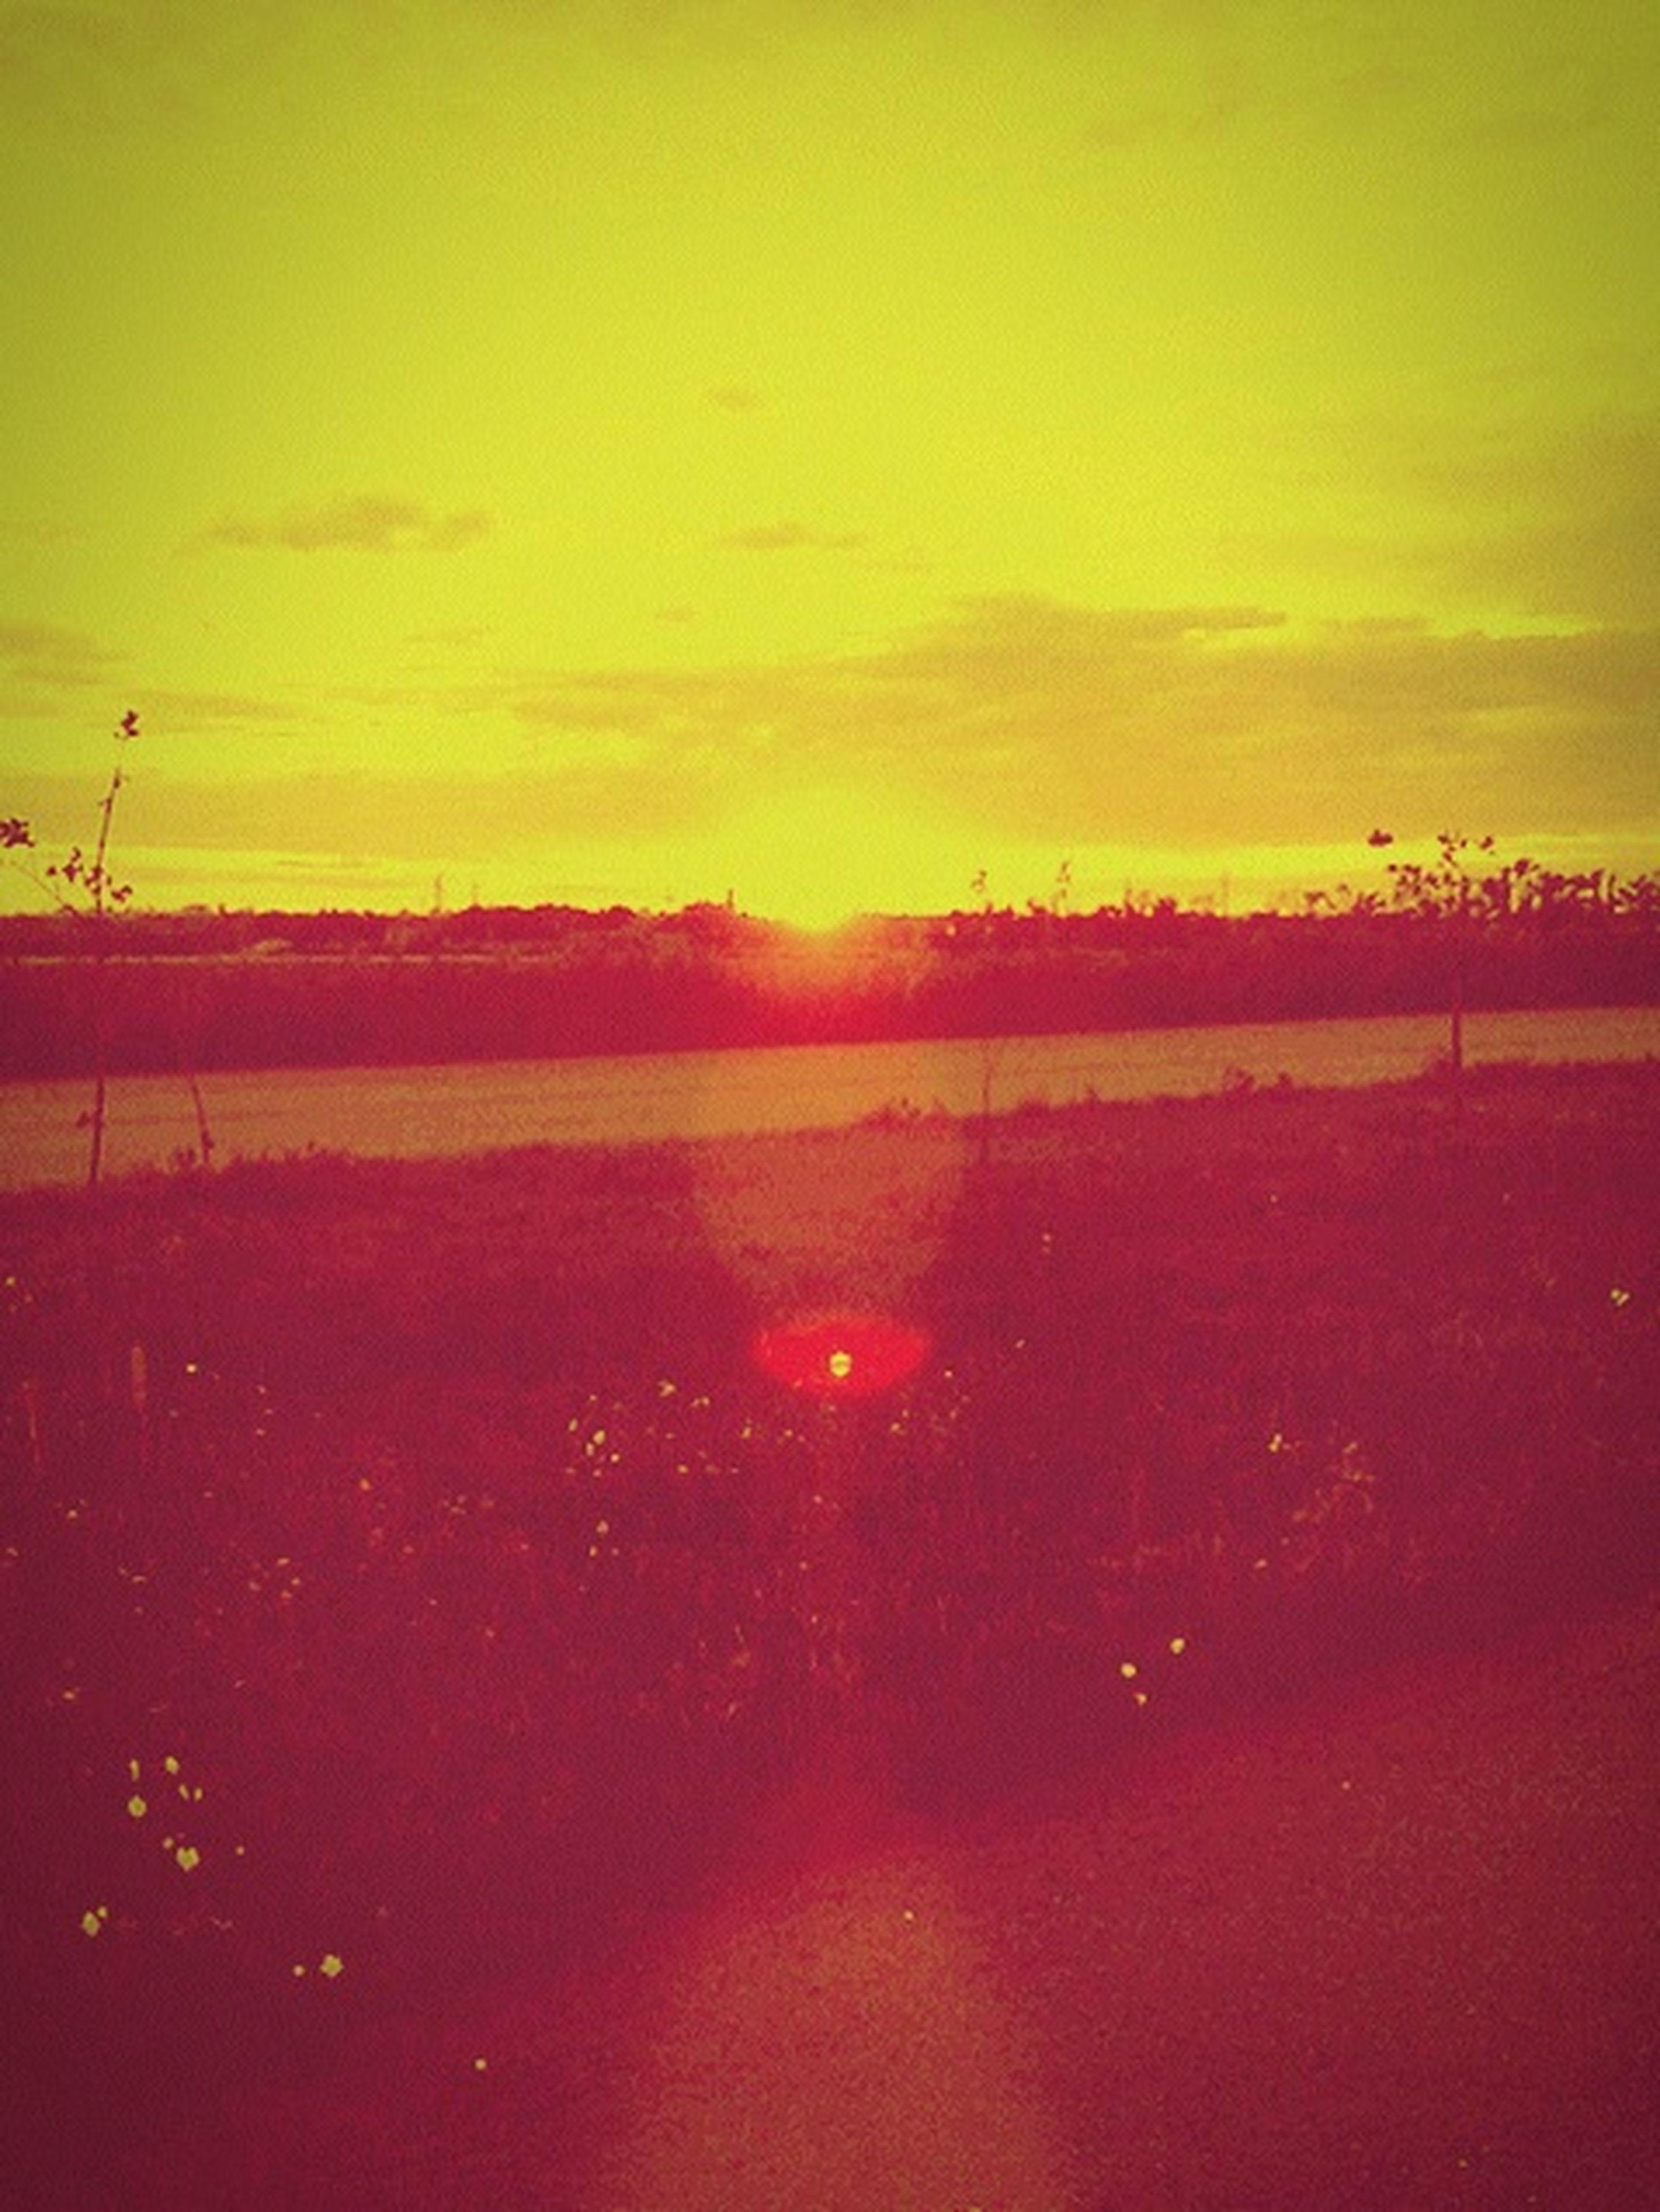 sunset, tranquil scene, scenics, tranquility, beauty in nature, sky, orange color, water, idyllic, nature, sun, landscape, sea, cloud - sky, beach, horizon over water, non-urban scene, remote, silhouette, outdoors